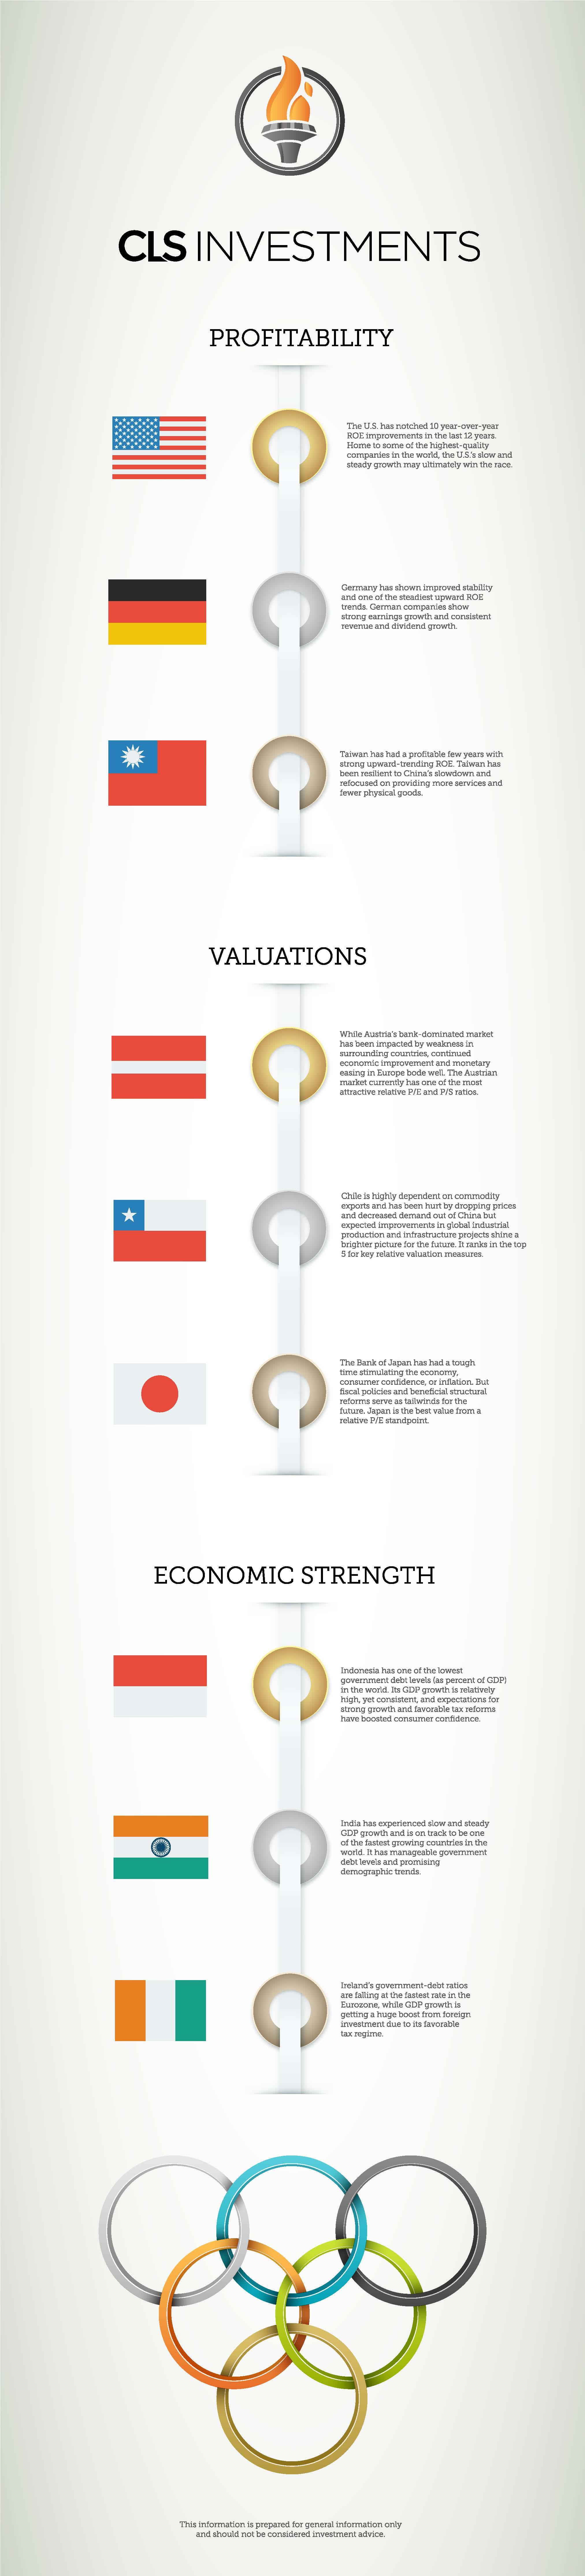 Olymipc_Infographic